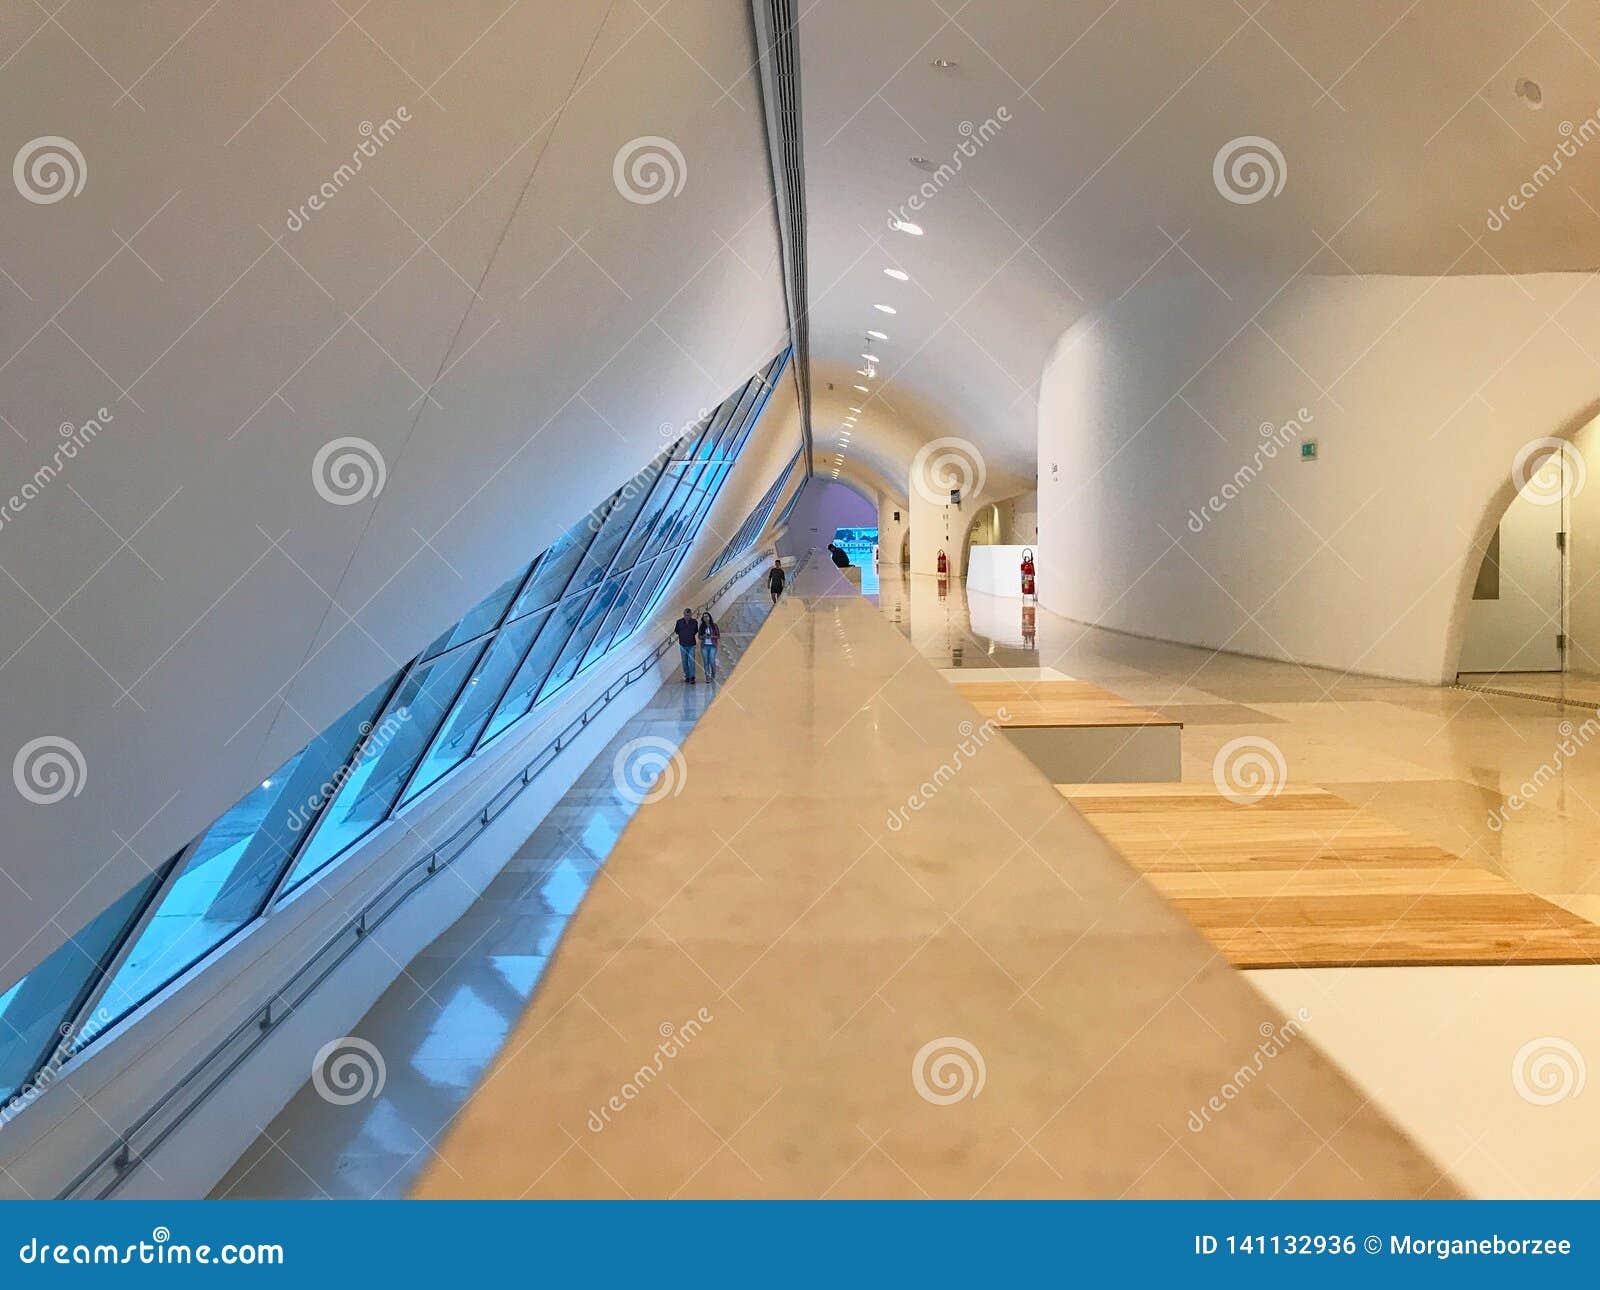 Amanha museuminre, arkitektur av Santiago Calatrava